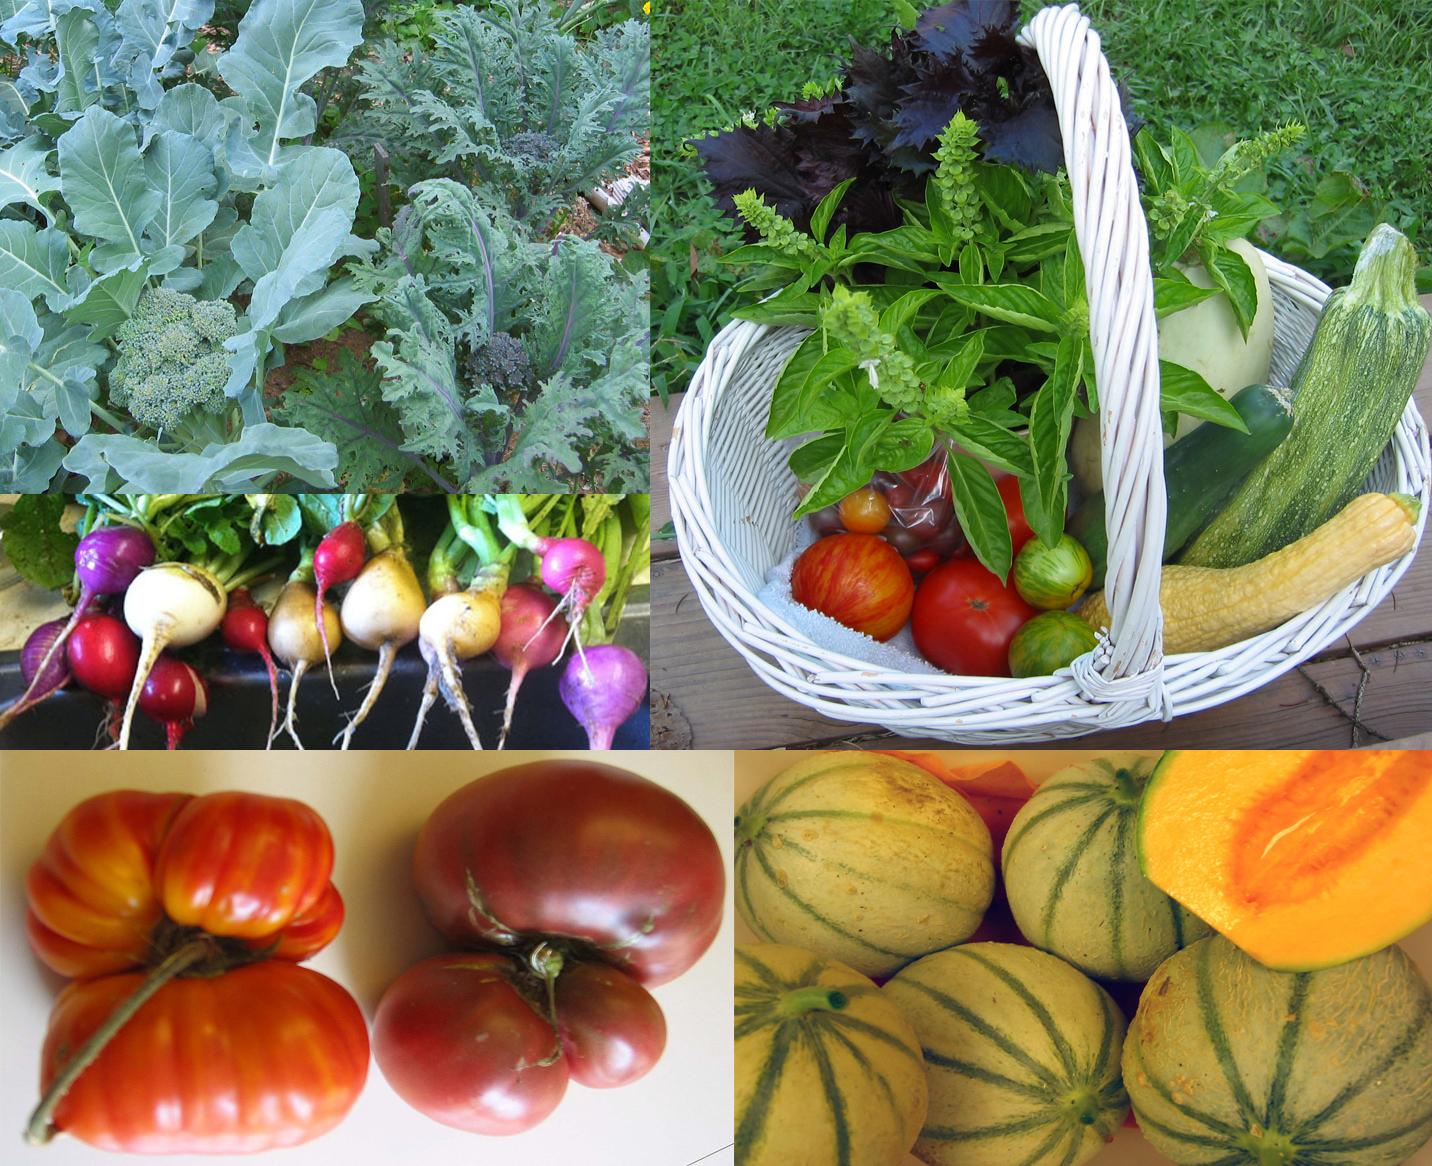 grow great veggies